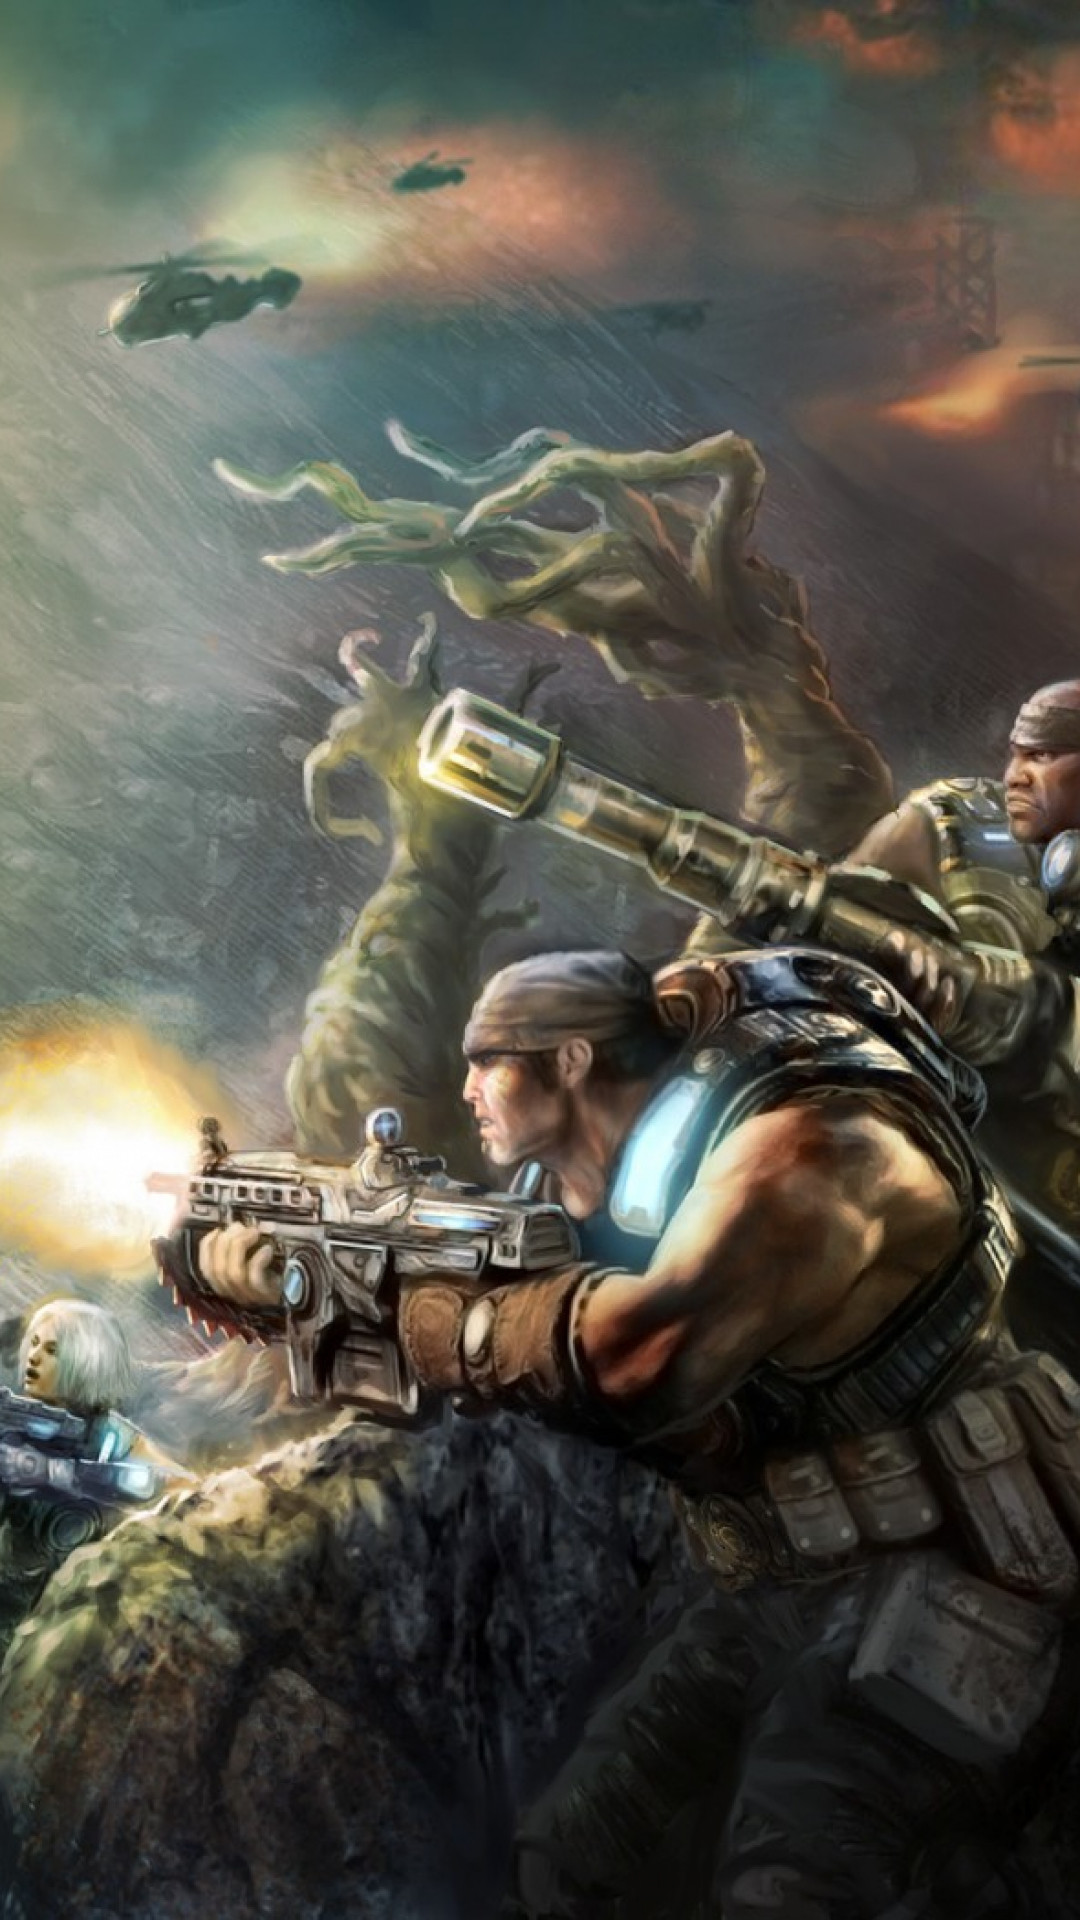 Gears of War Judgement Wallpaper (74+ images)